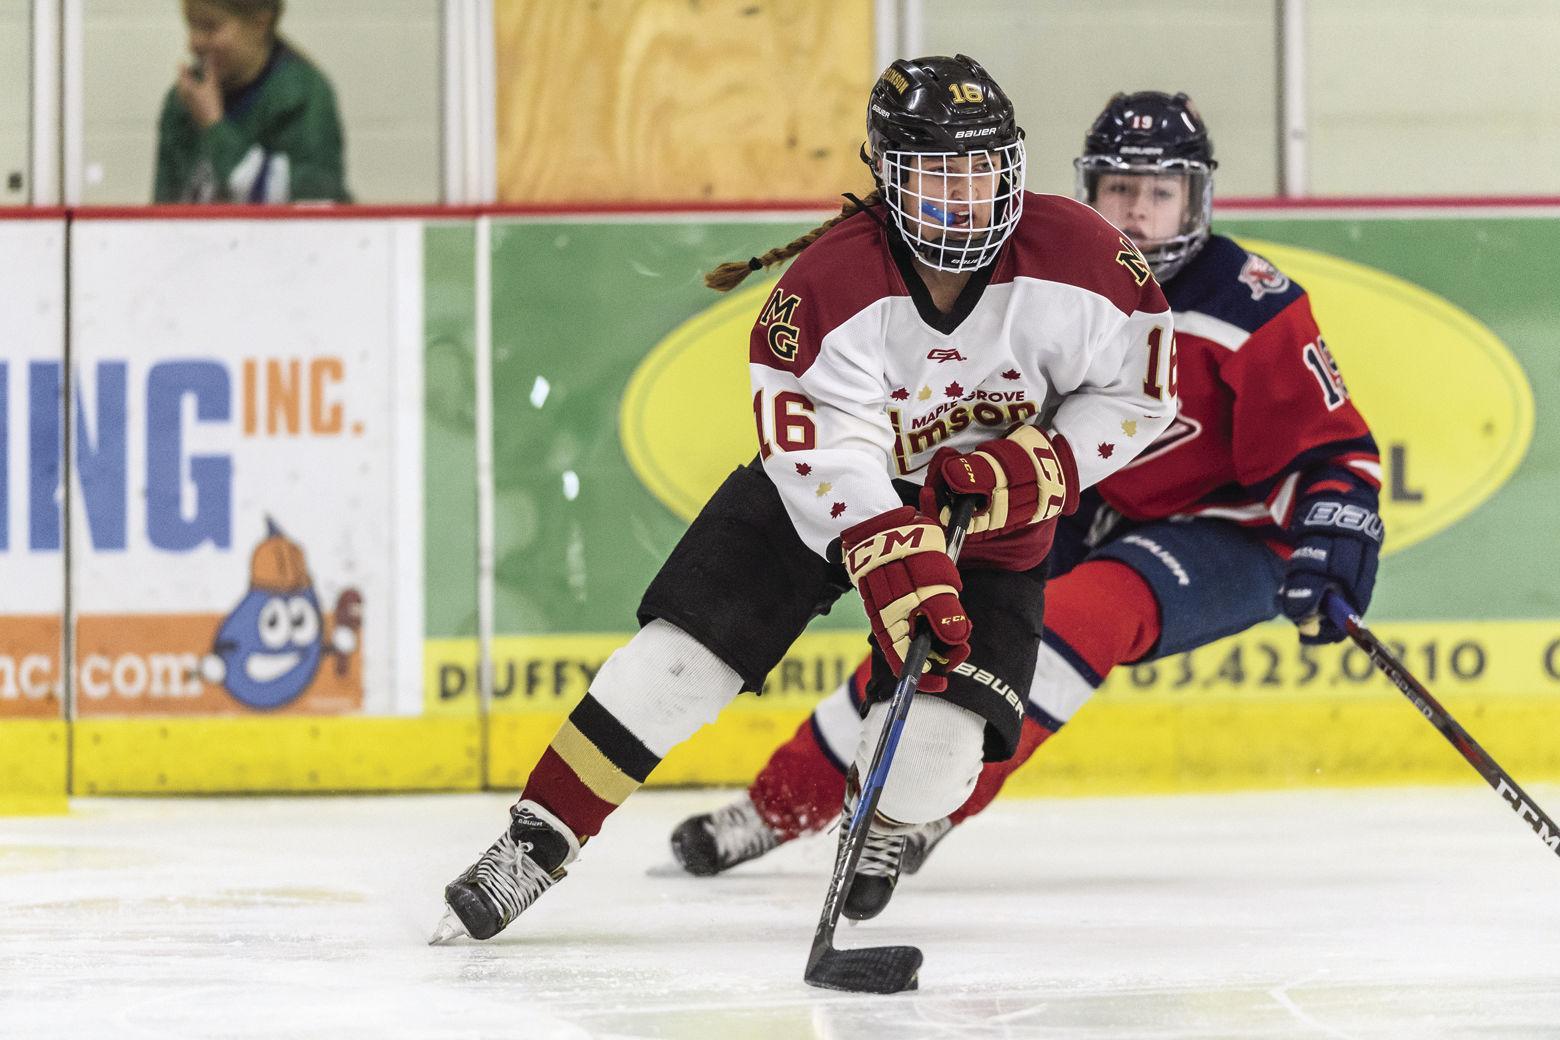 Girls Hockey: Score overtime win at Blaine